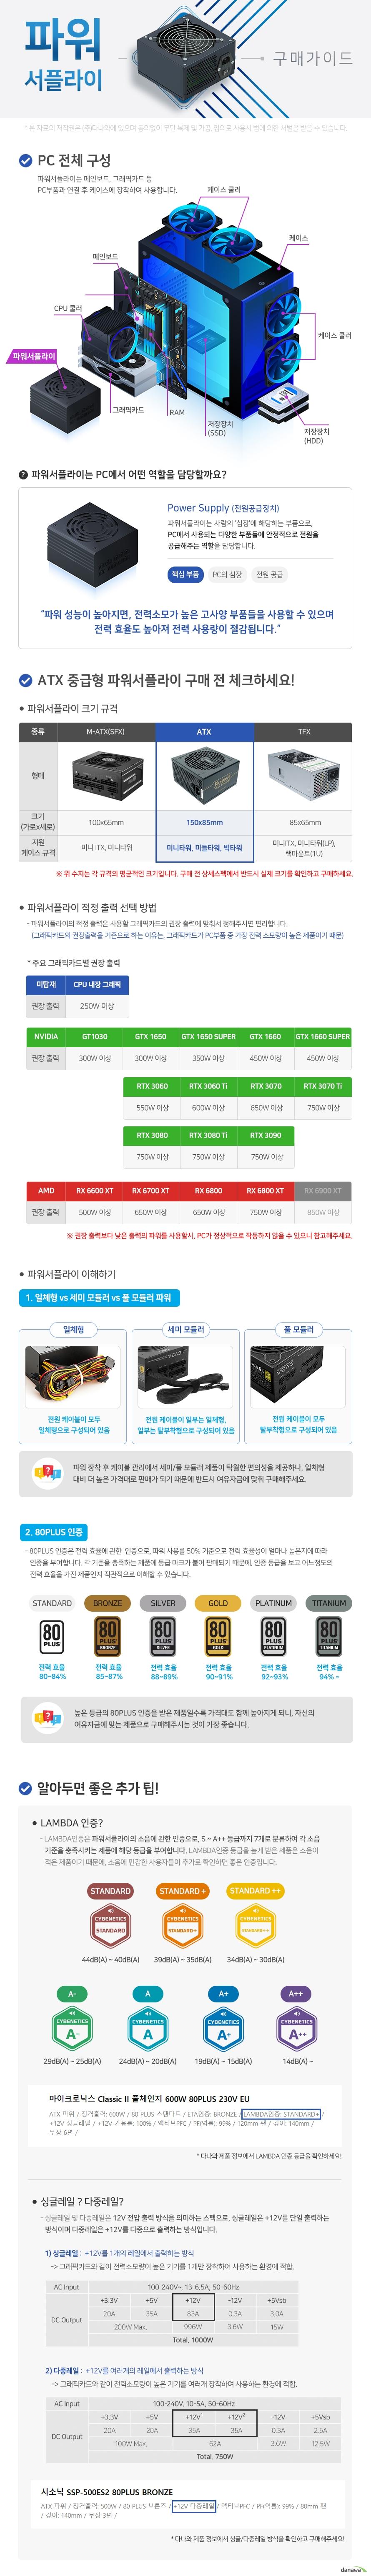 FSP HYDRO GSM PRO 750W 80PLUS Gold Modular